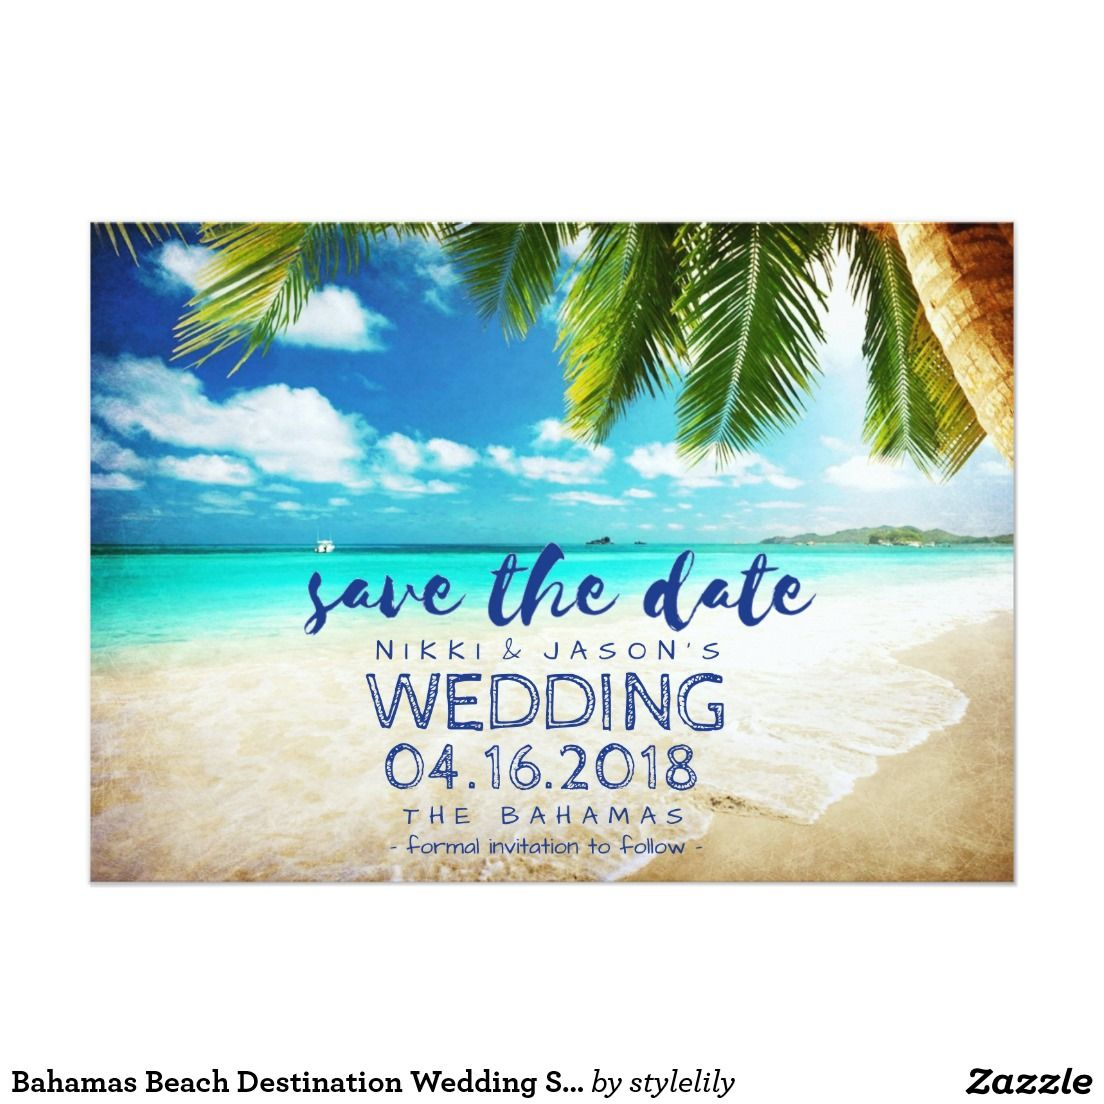 Bahamas Beach Destination Wedding Save The Dates Save The Date Zazzle Com Beach Destination Wedding Destination Wedding Save The Dates Destin Beach